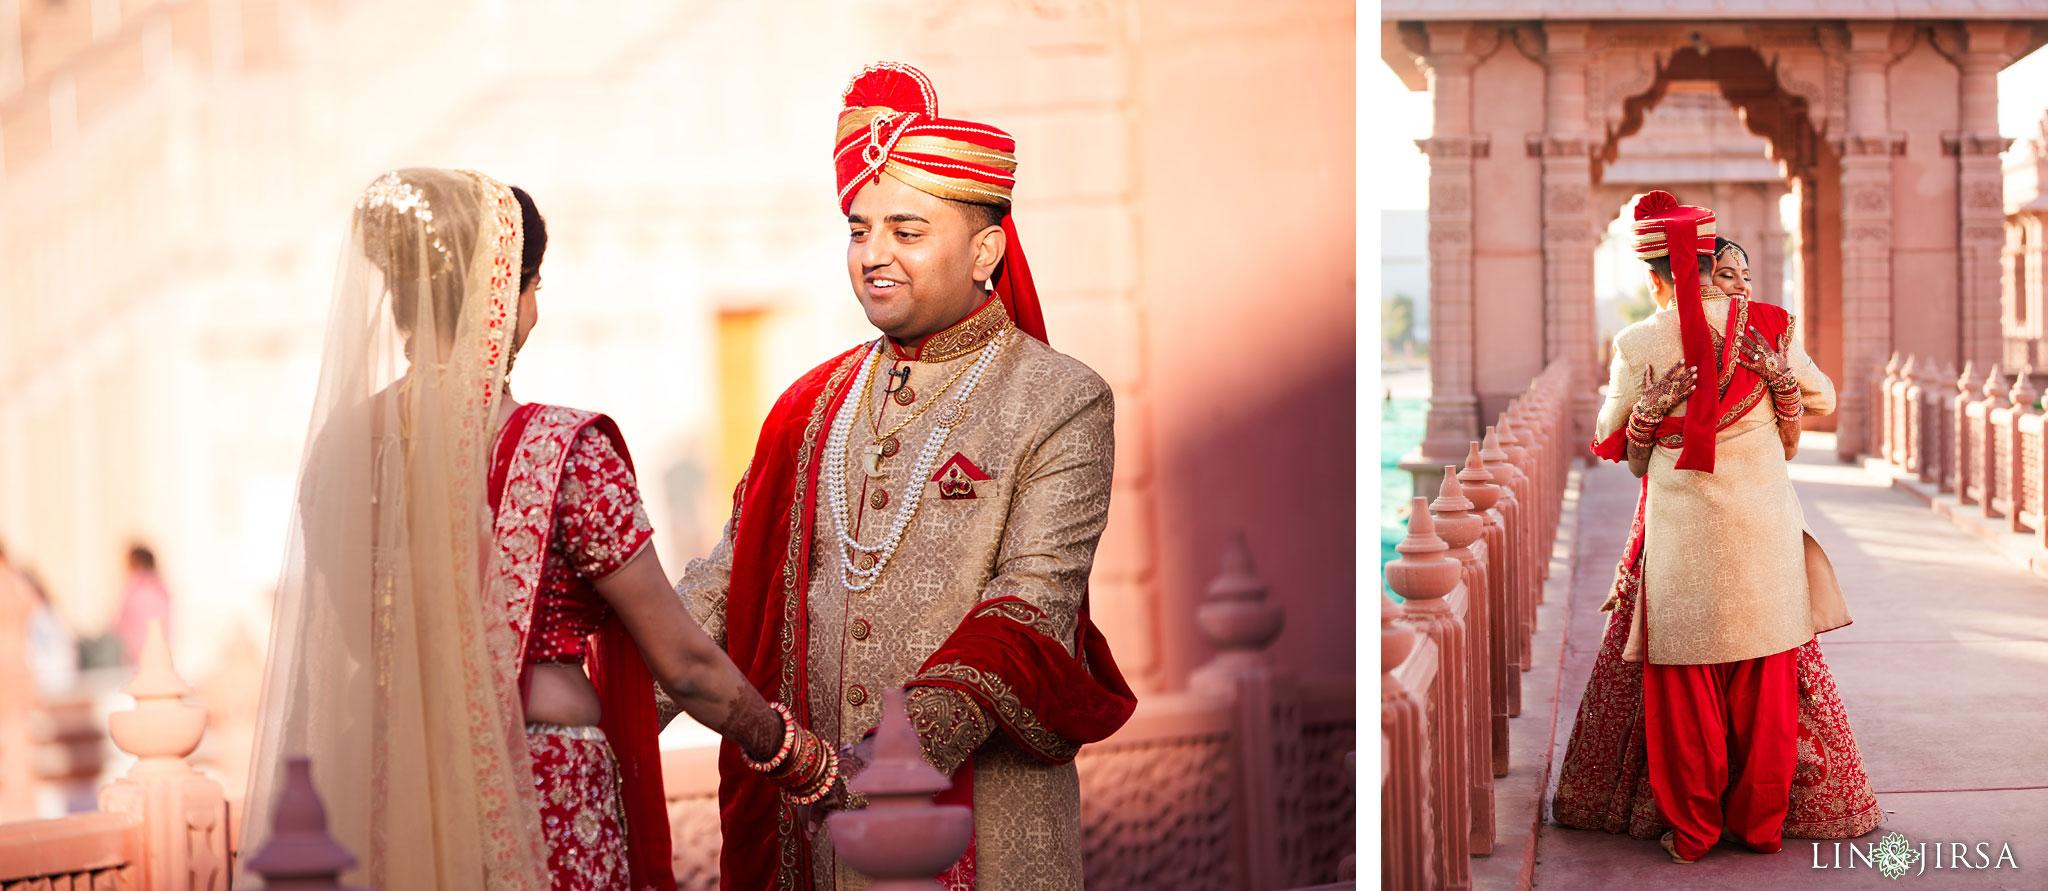 072 BAPS Swaminarayan Sanstha Chino Hills Indian Wedding Photography